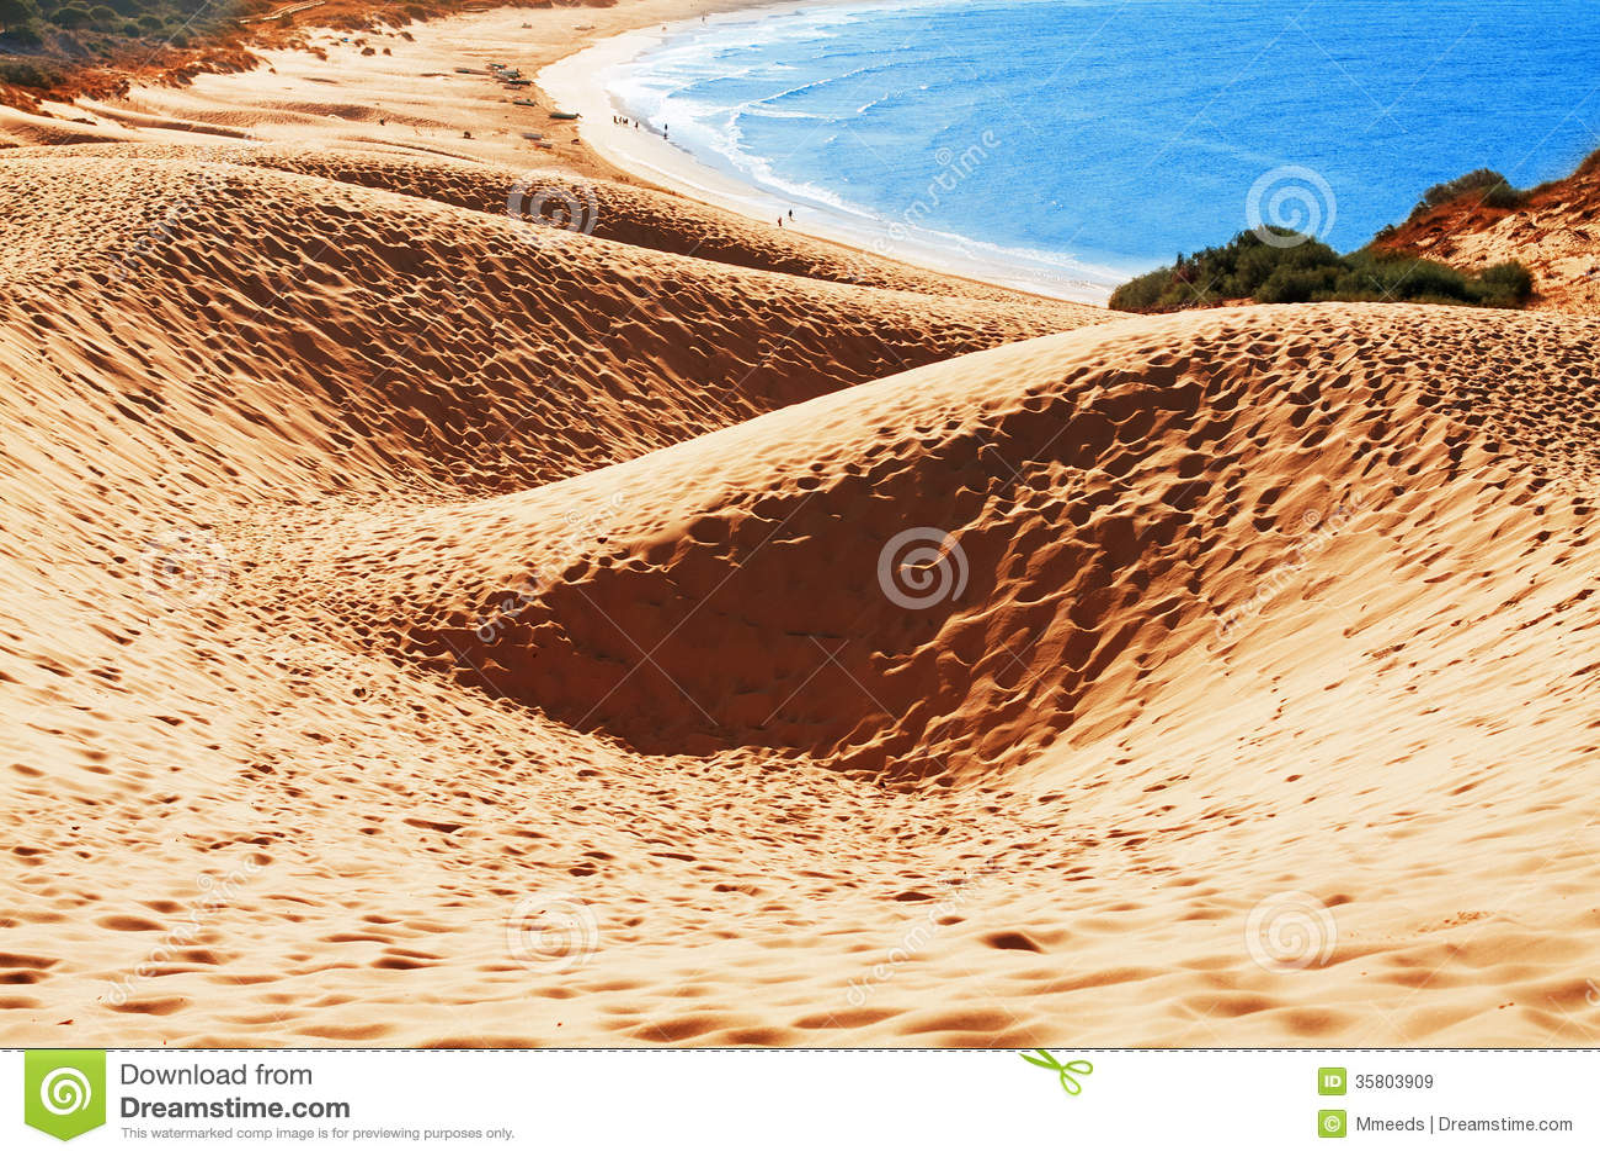 Duna de arena de la playa de bolonia provincia c diz for Arena de playa precio